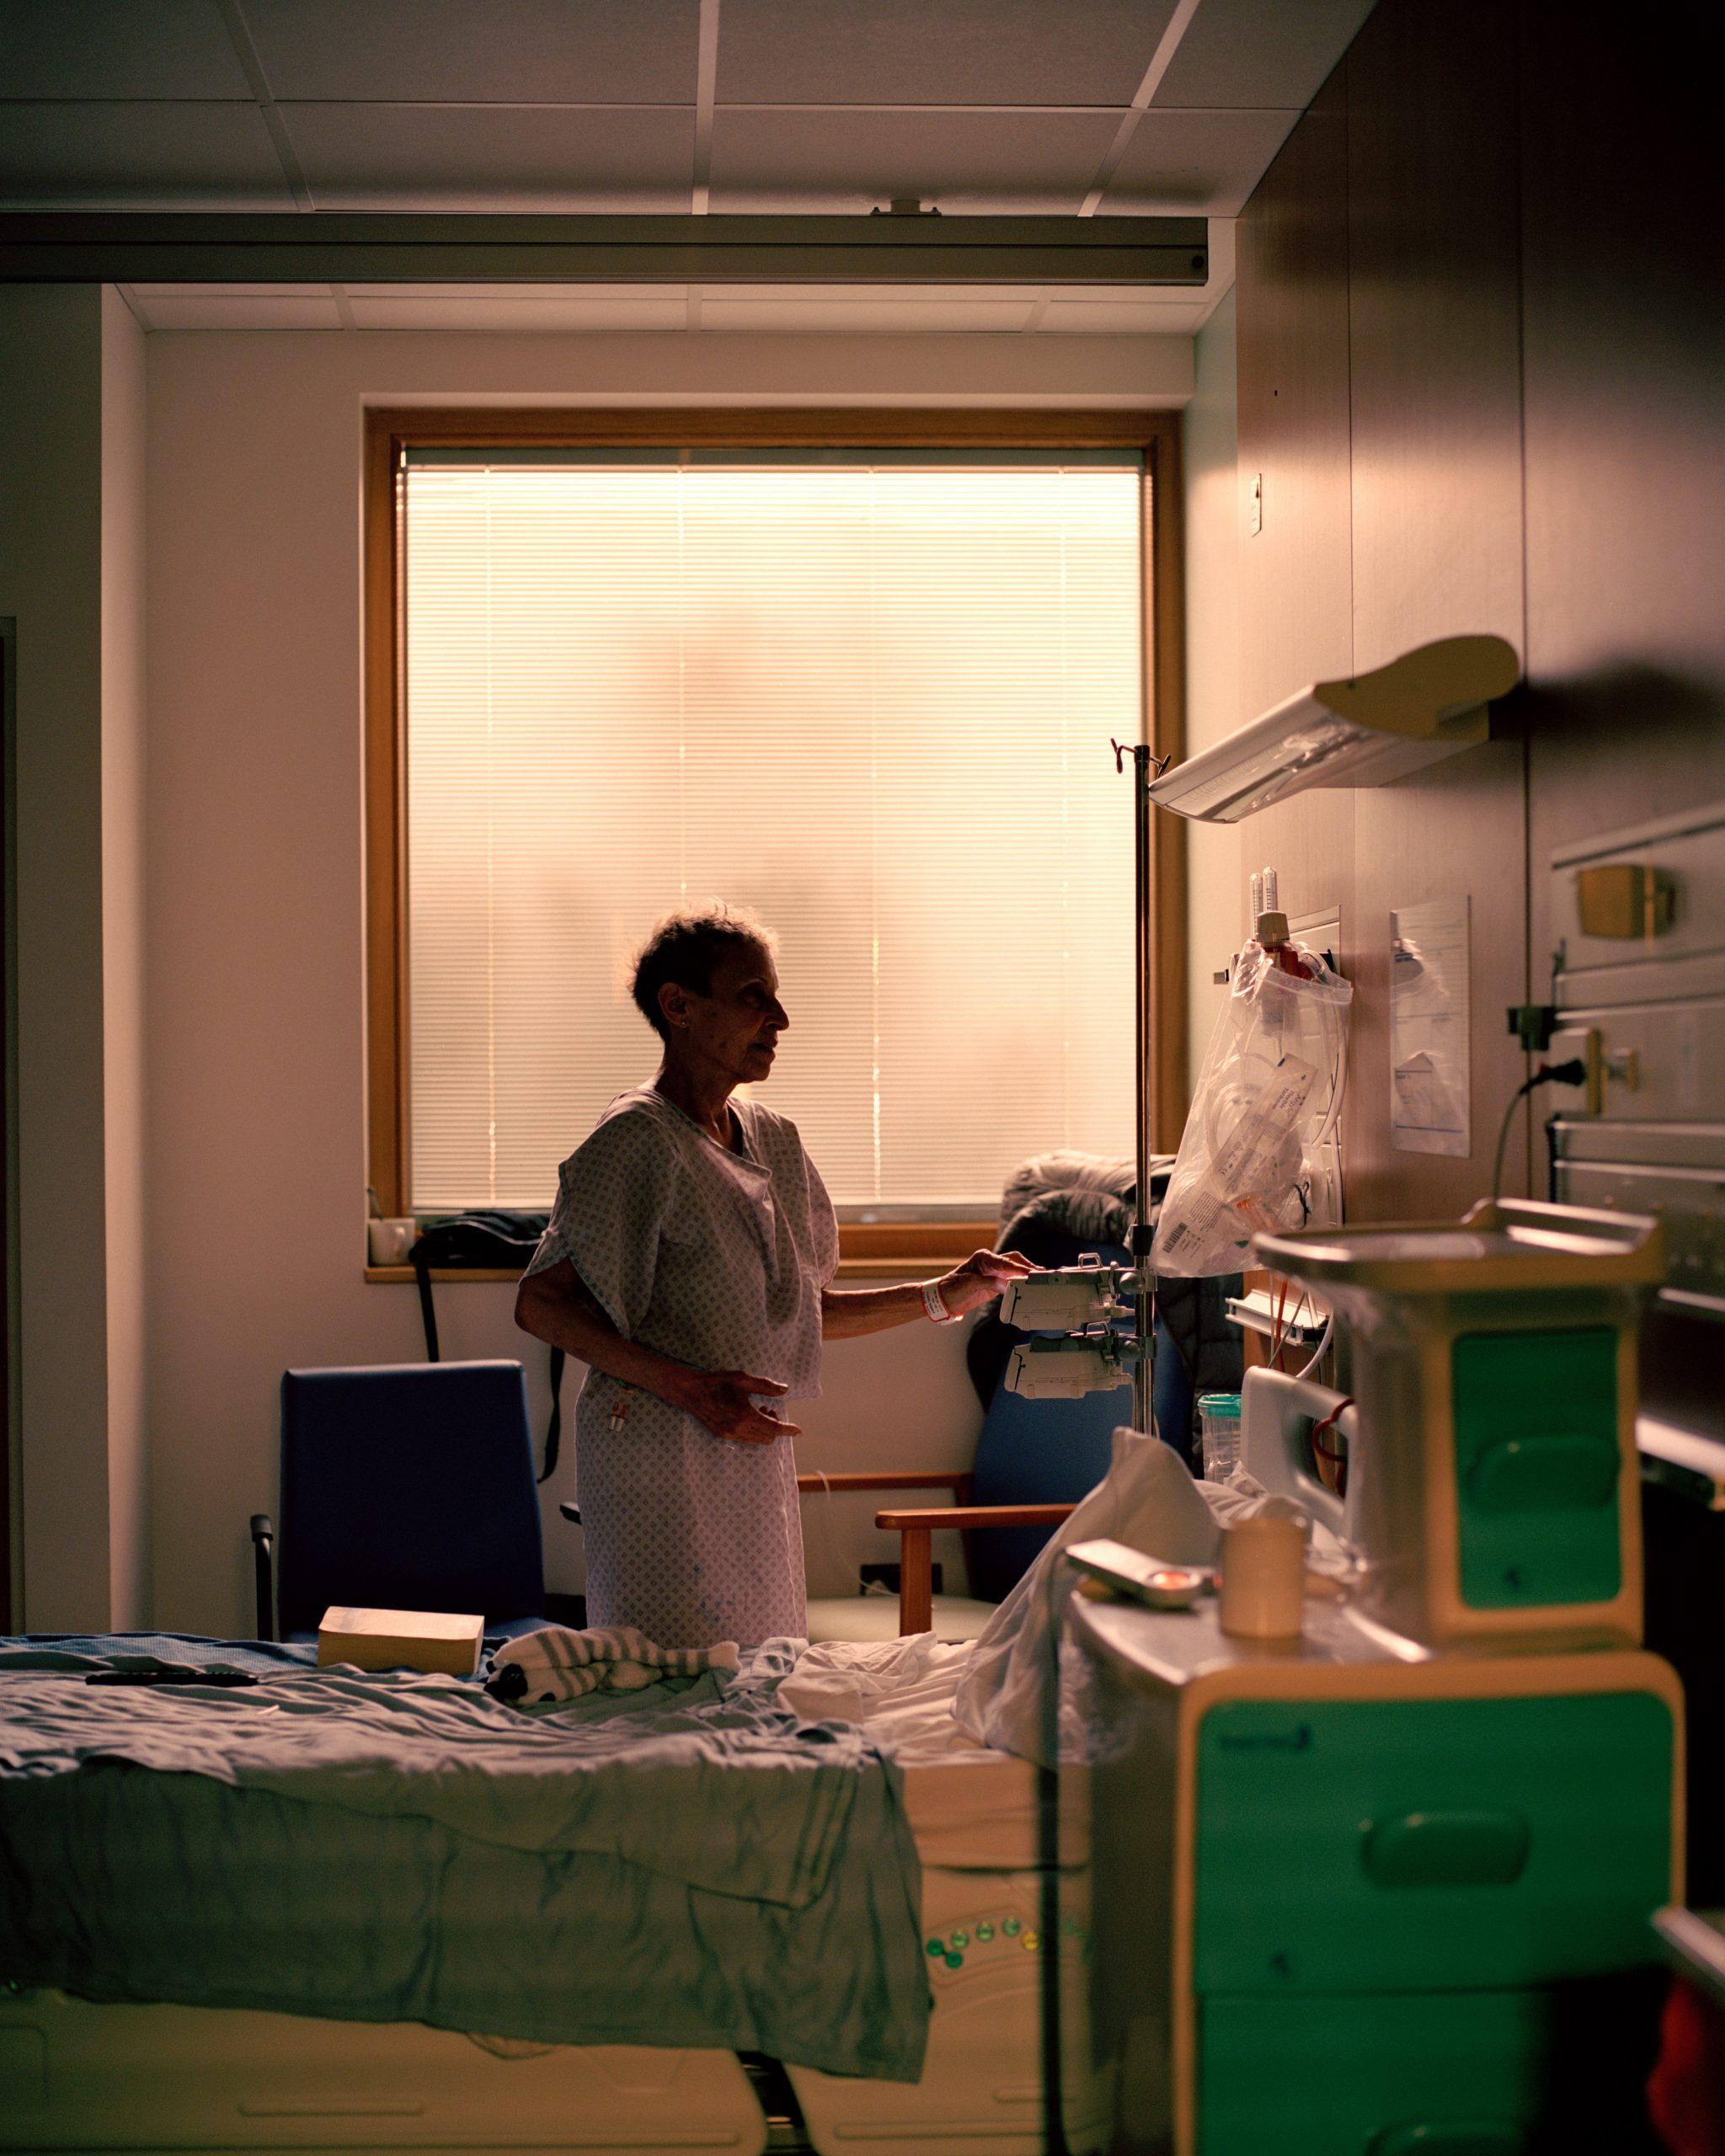 Lewis Khan, Theatre, Patient room